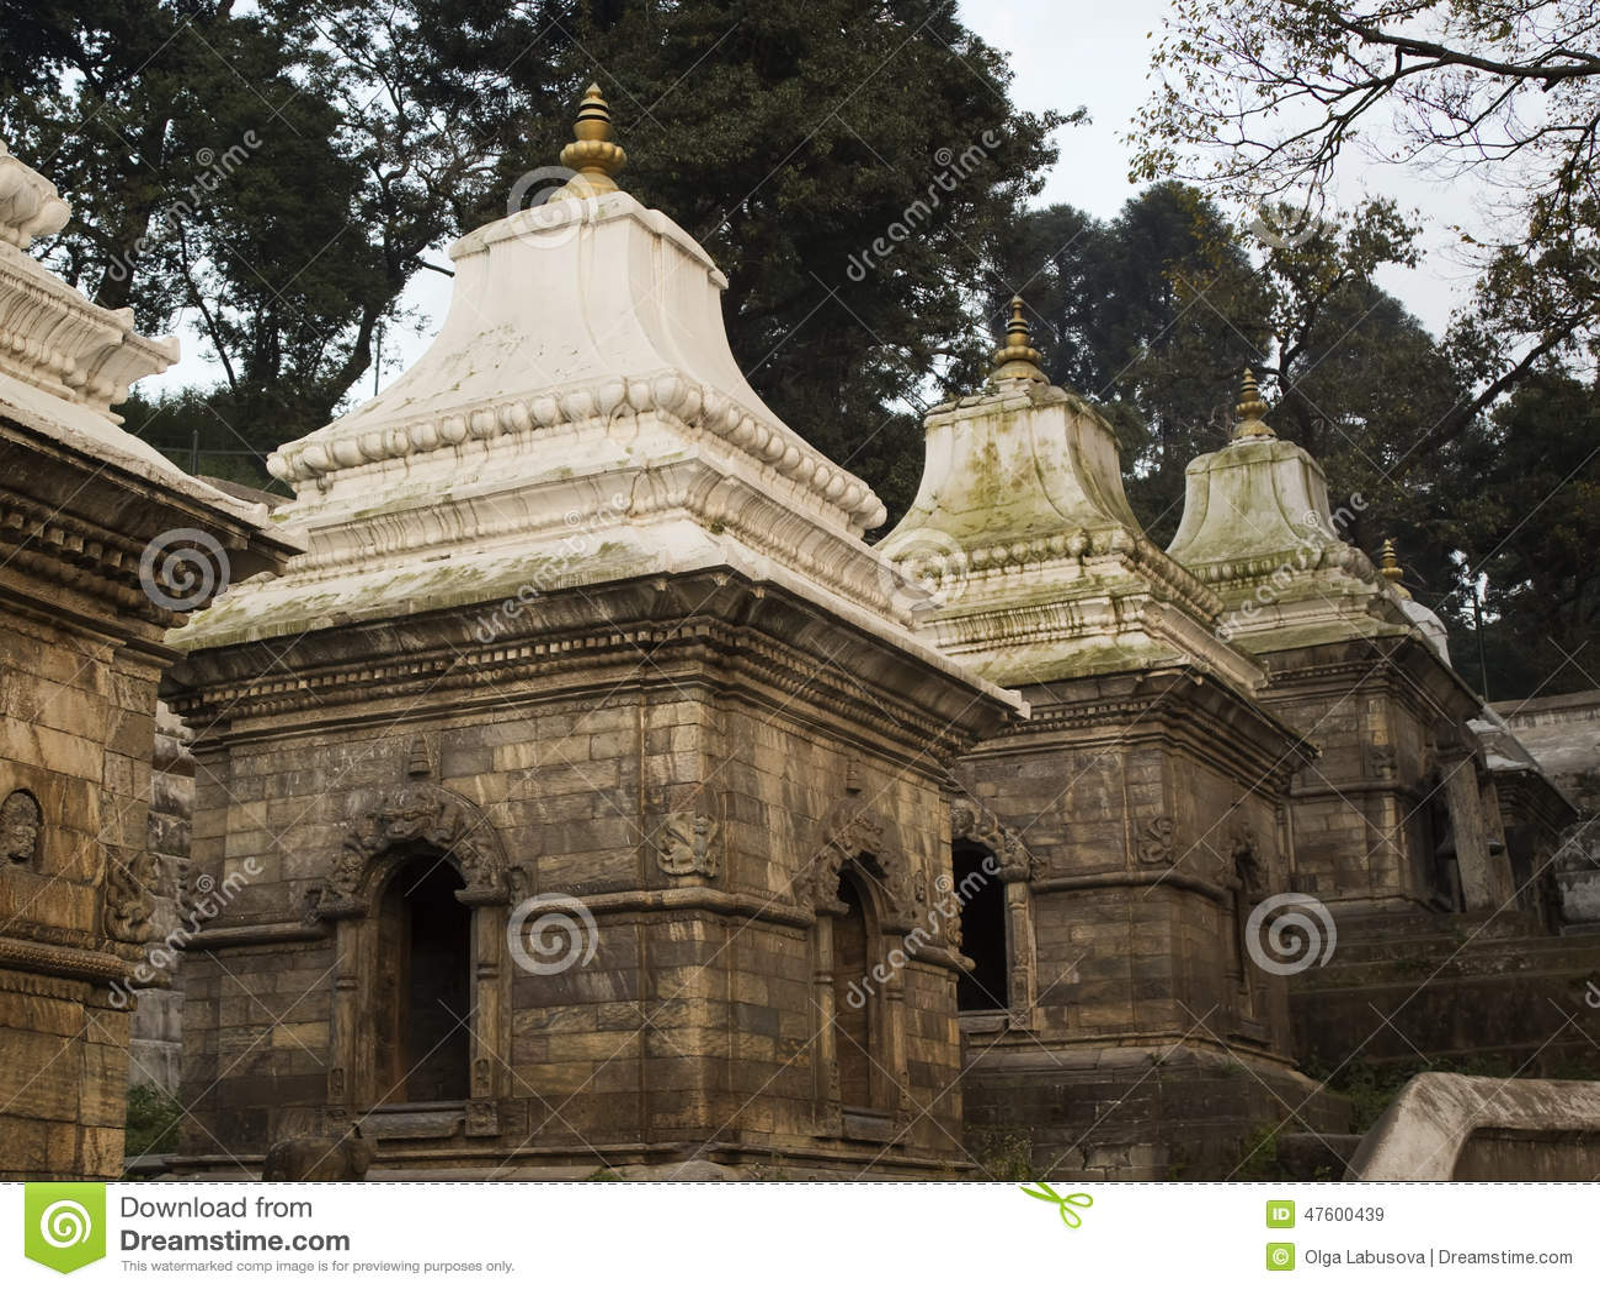 Pashupatinath temple complex on Bagmati River in Kathmandu Valley, Nepal